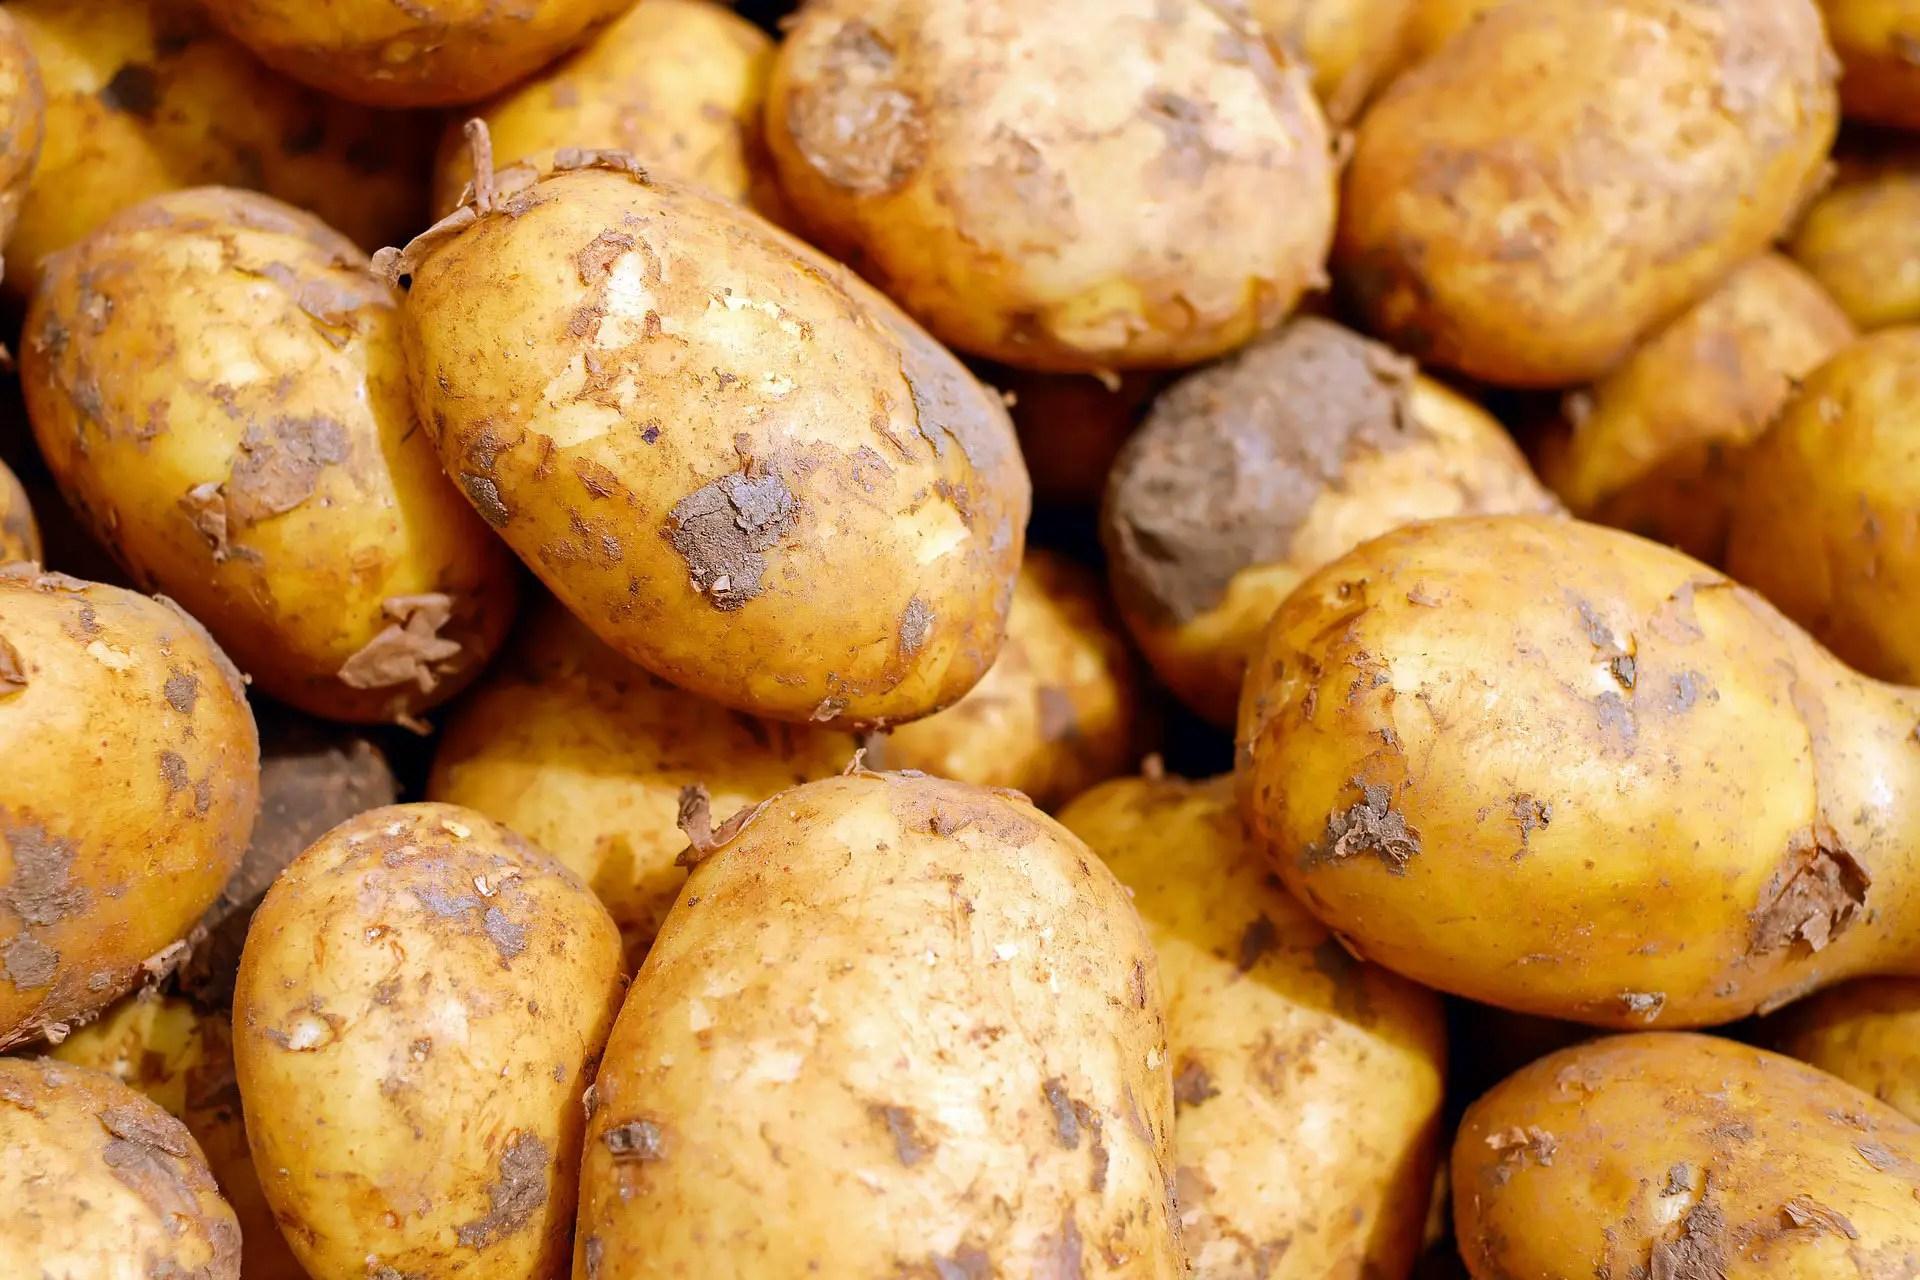 Kartoffeln kochen – so geht's ohne Schnellkochtopf!